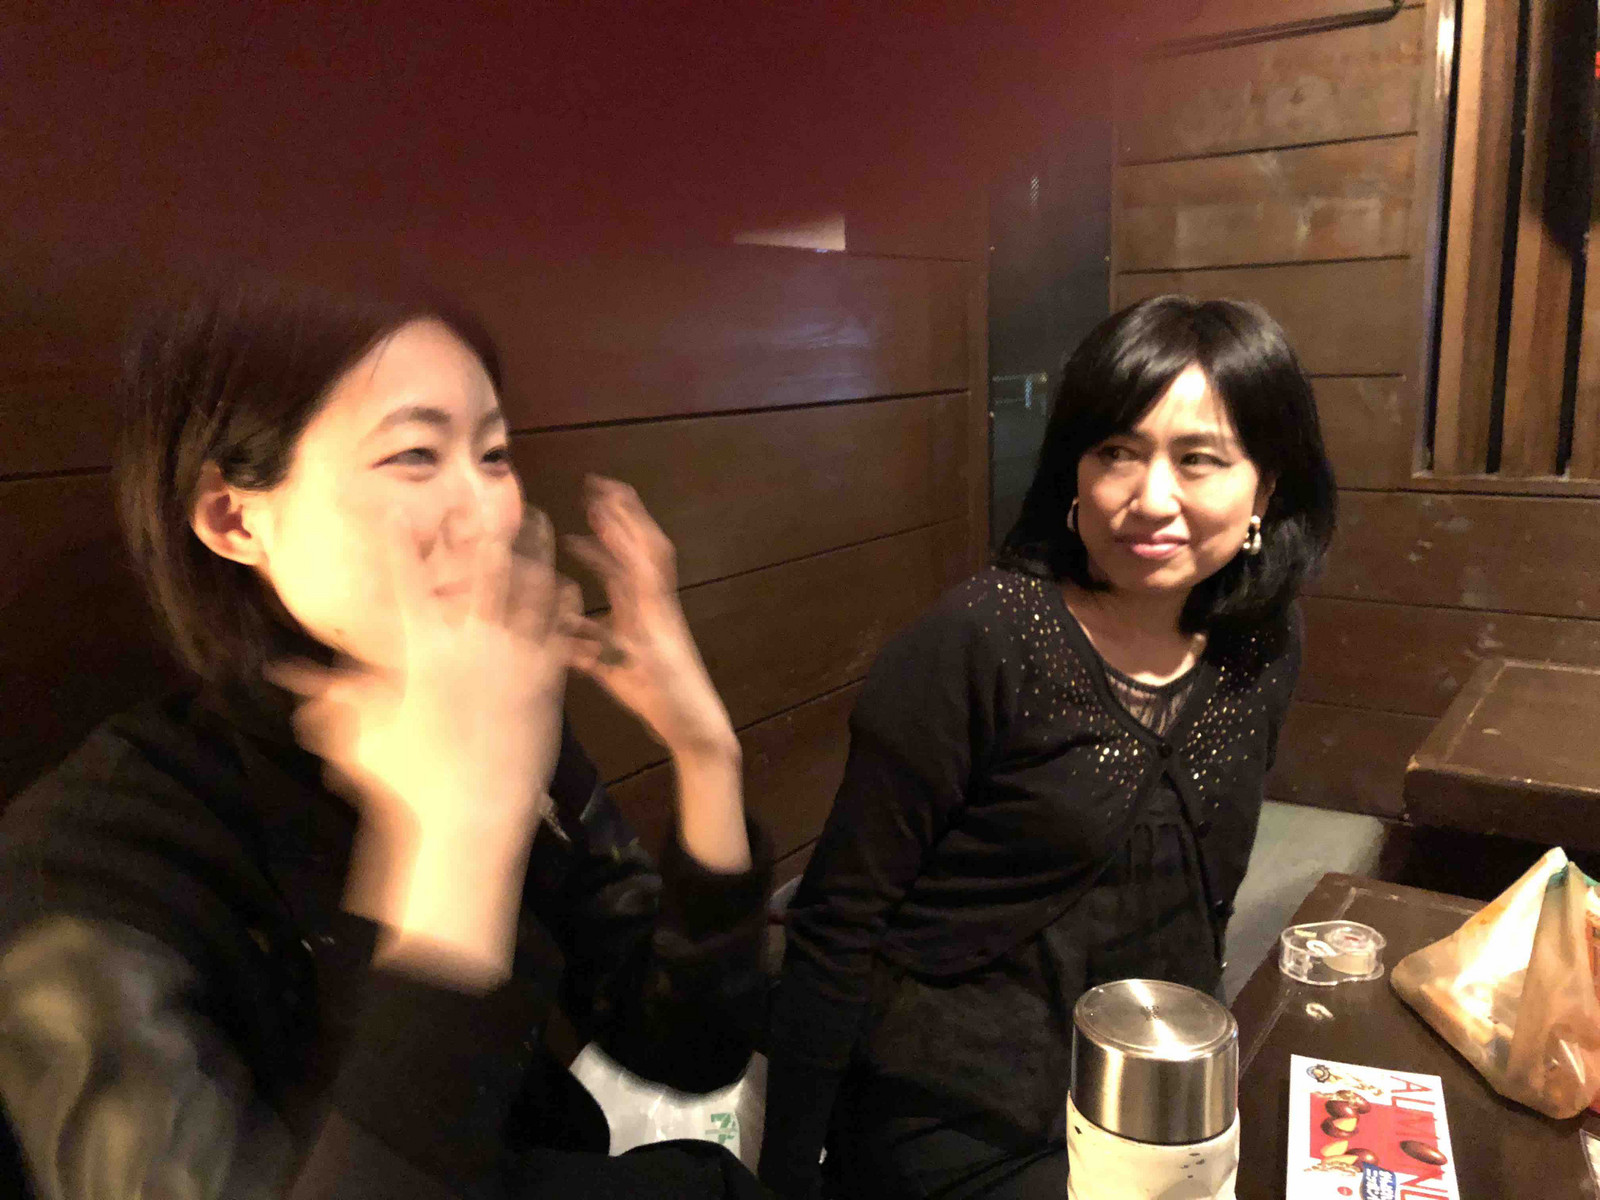 Lady_jane